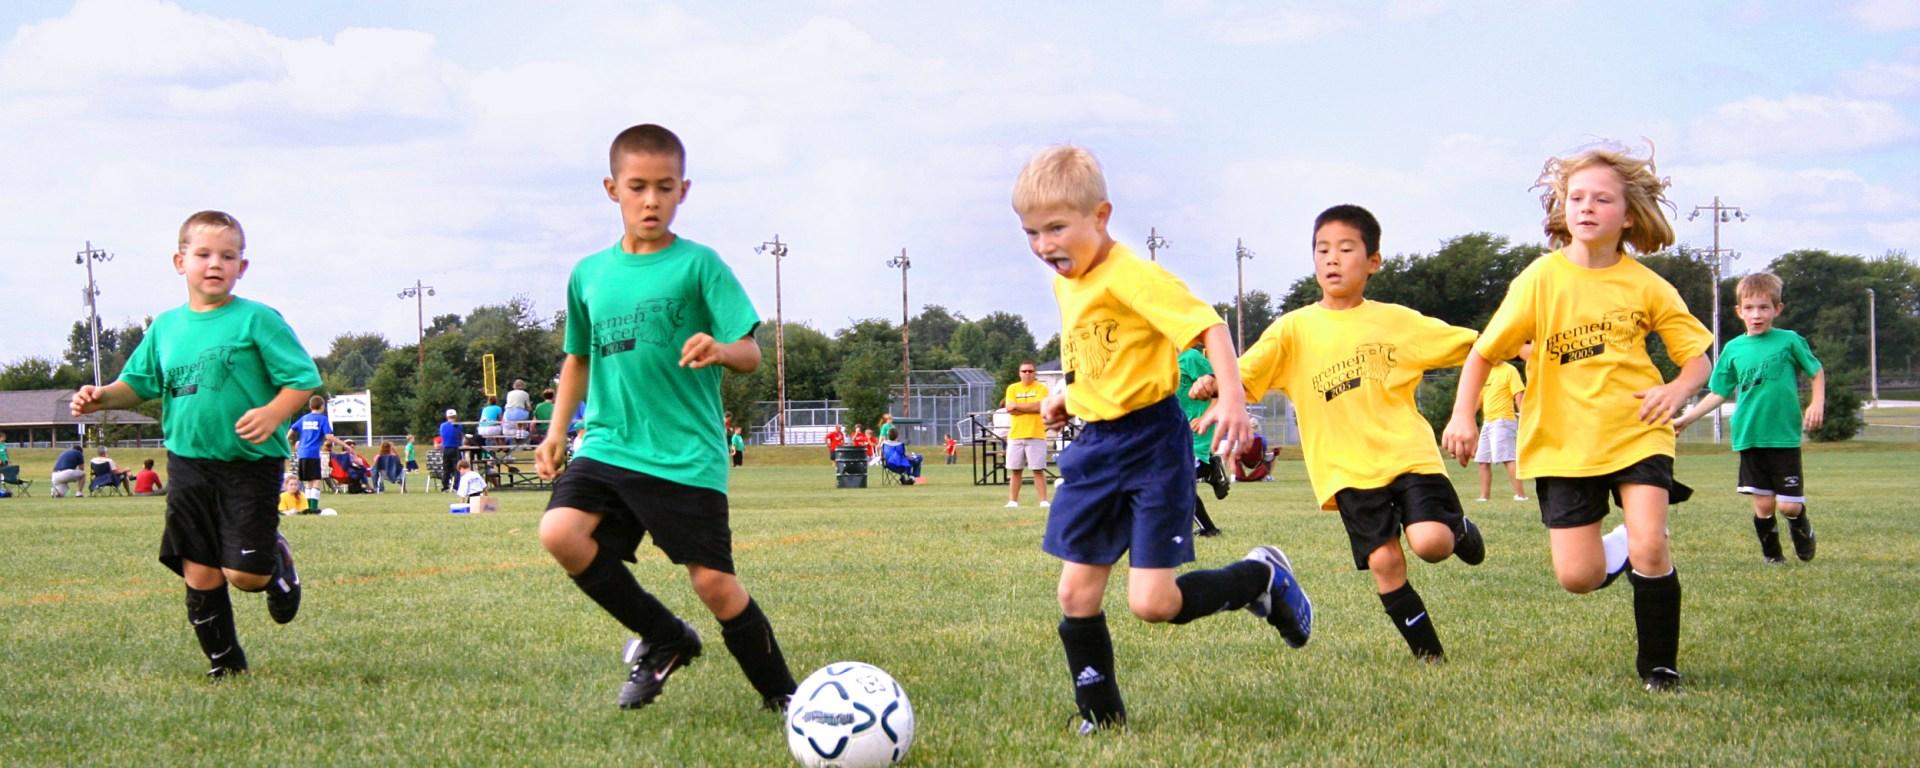 Sport helps children's fitness levels